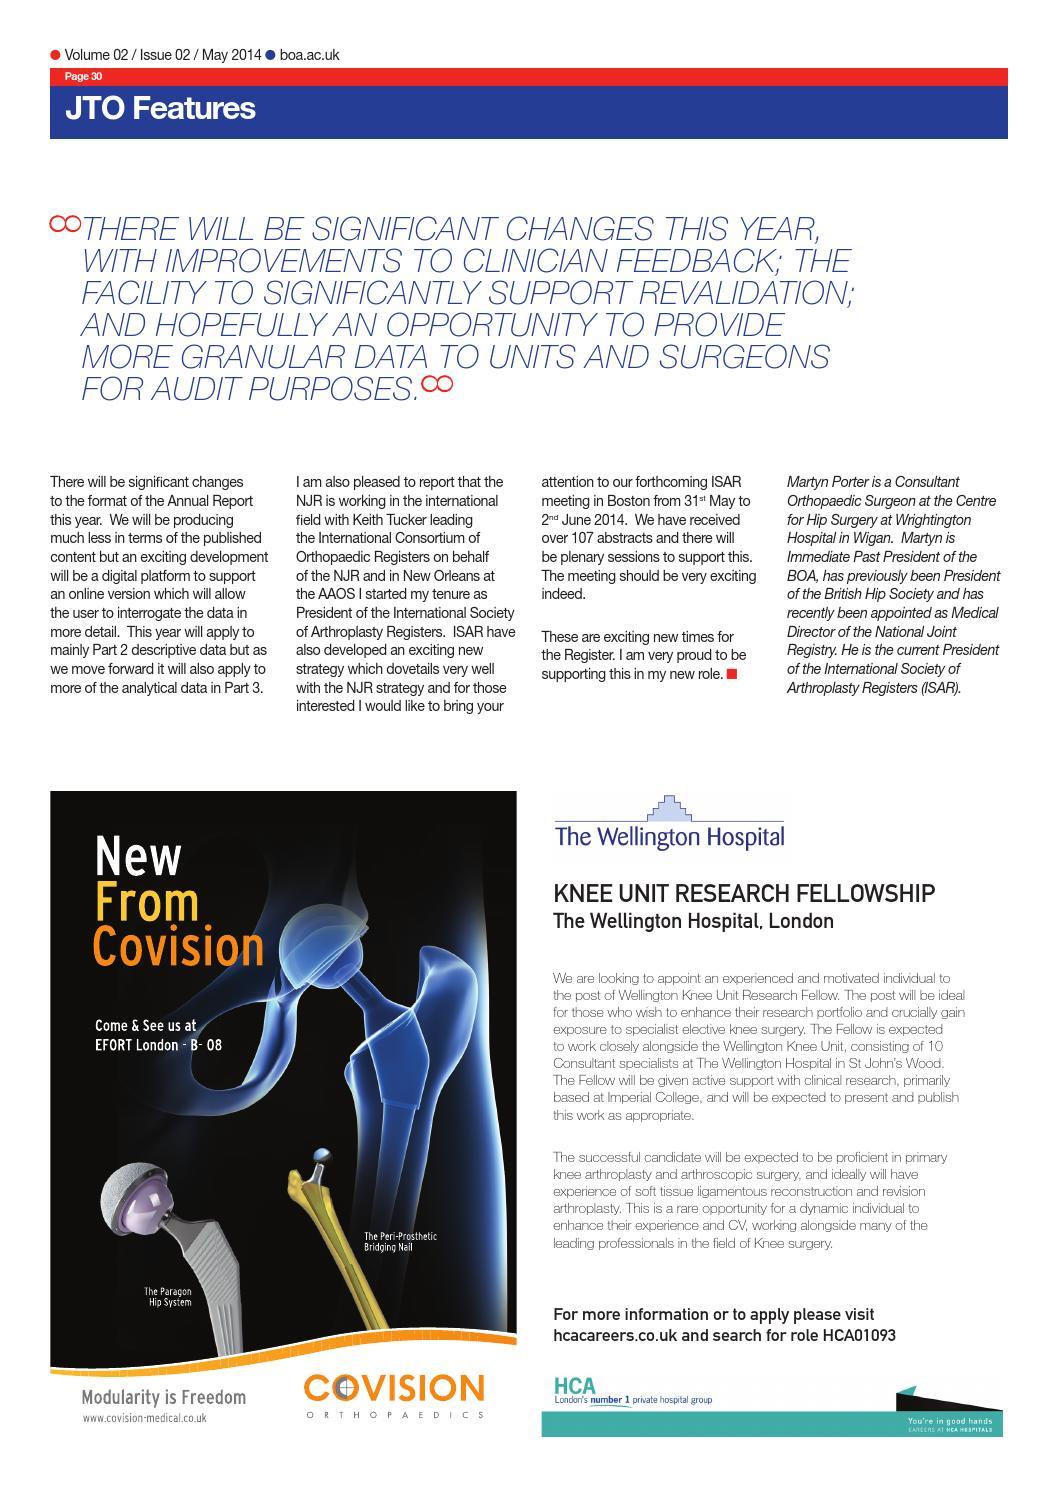 Journal of Trauma & Orthopaedics - Vol 2 / Iss 2 by British